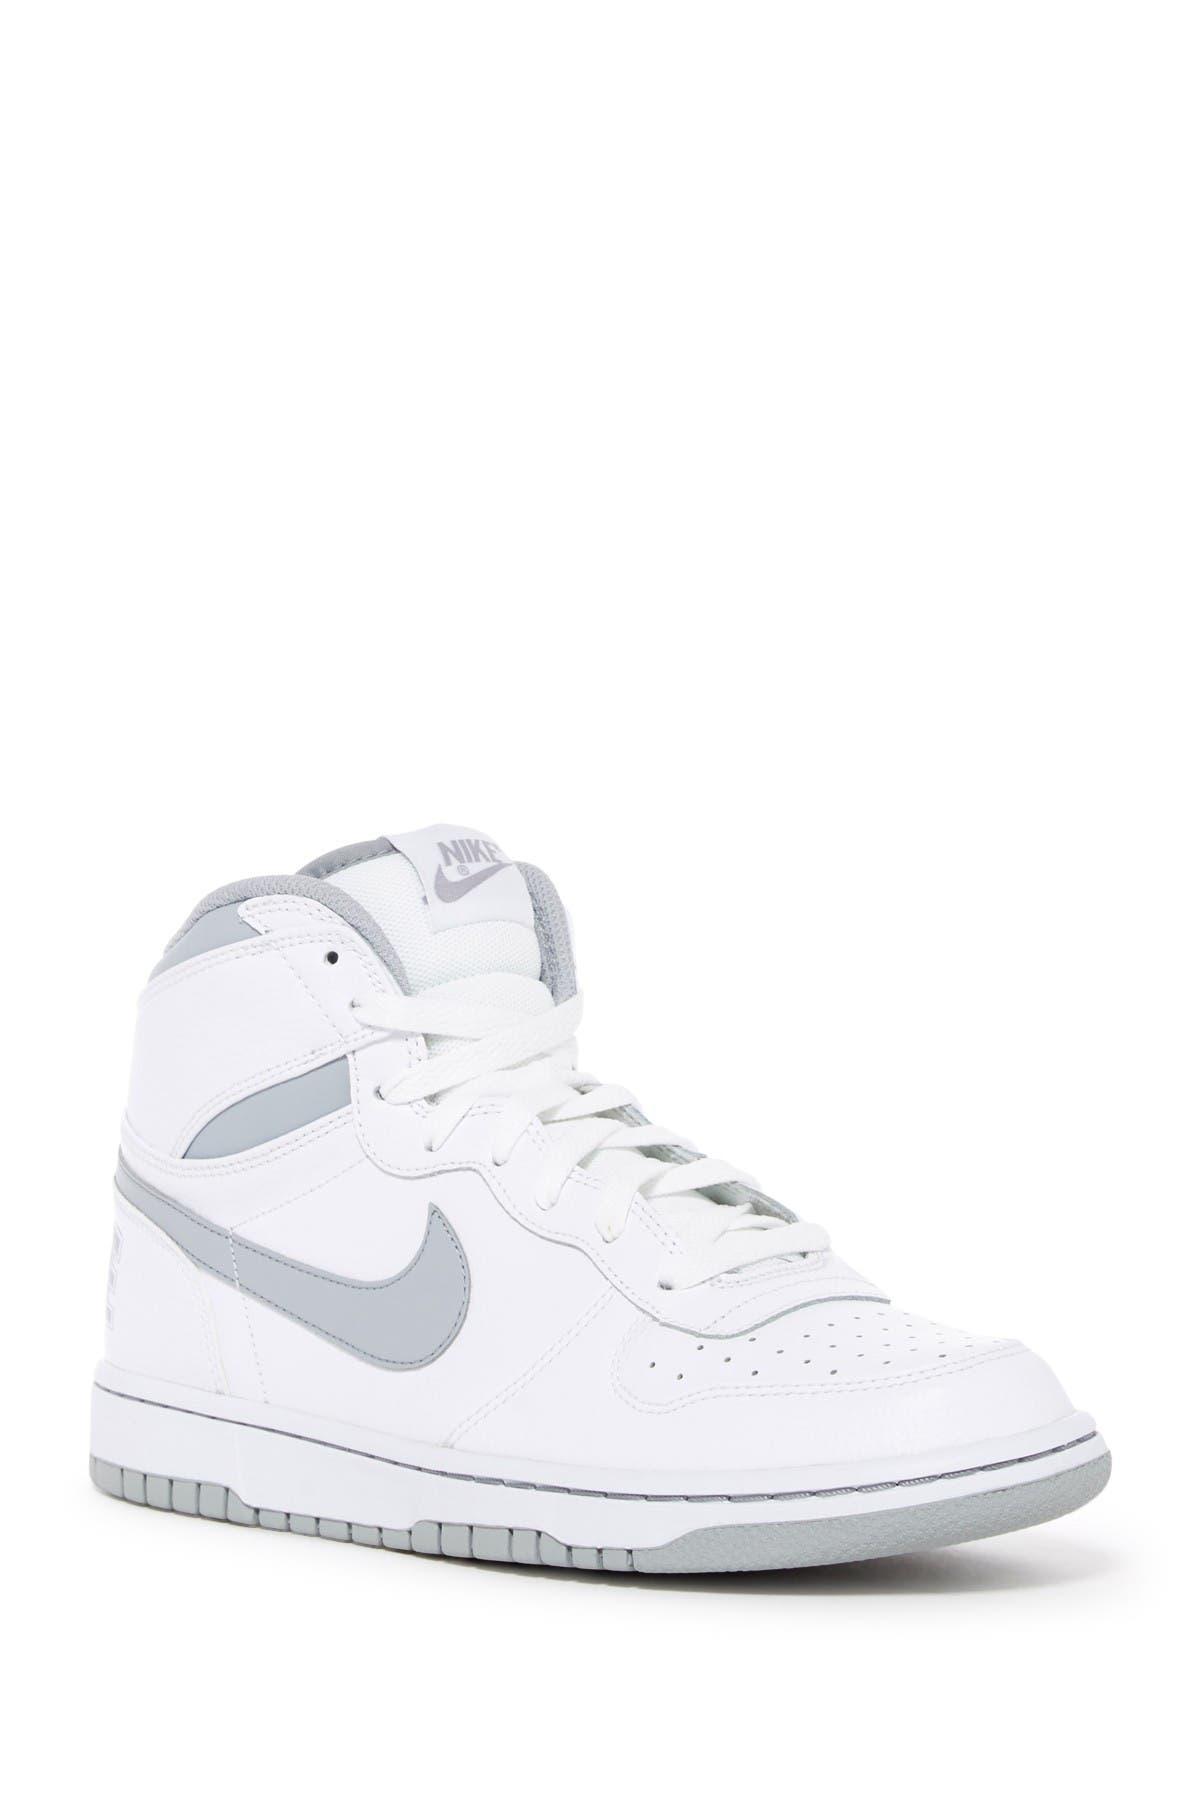 Nike | Big Nike High Top Sneaker